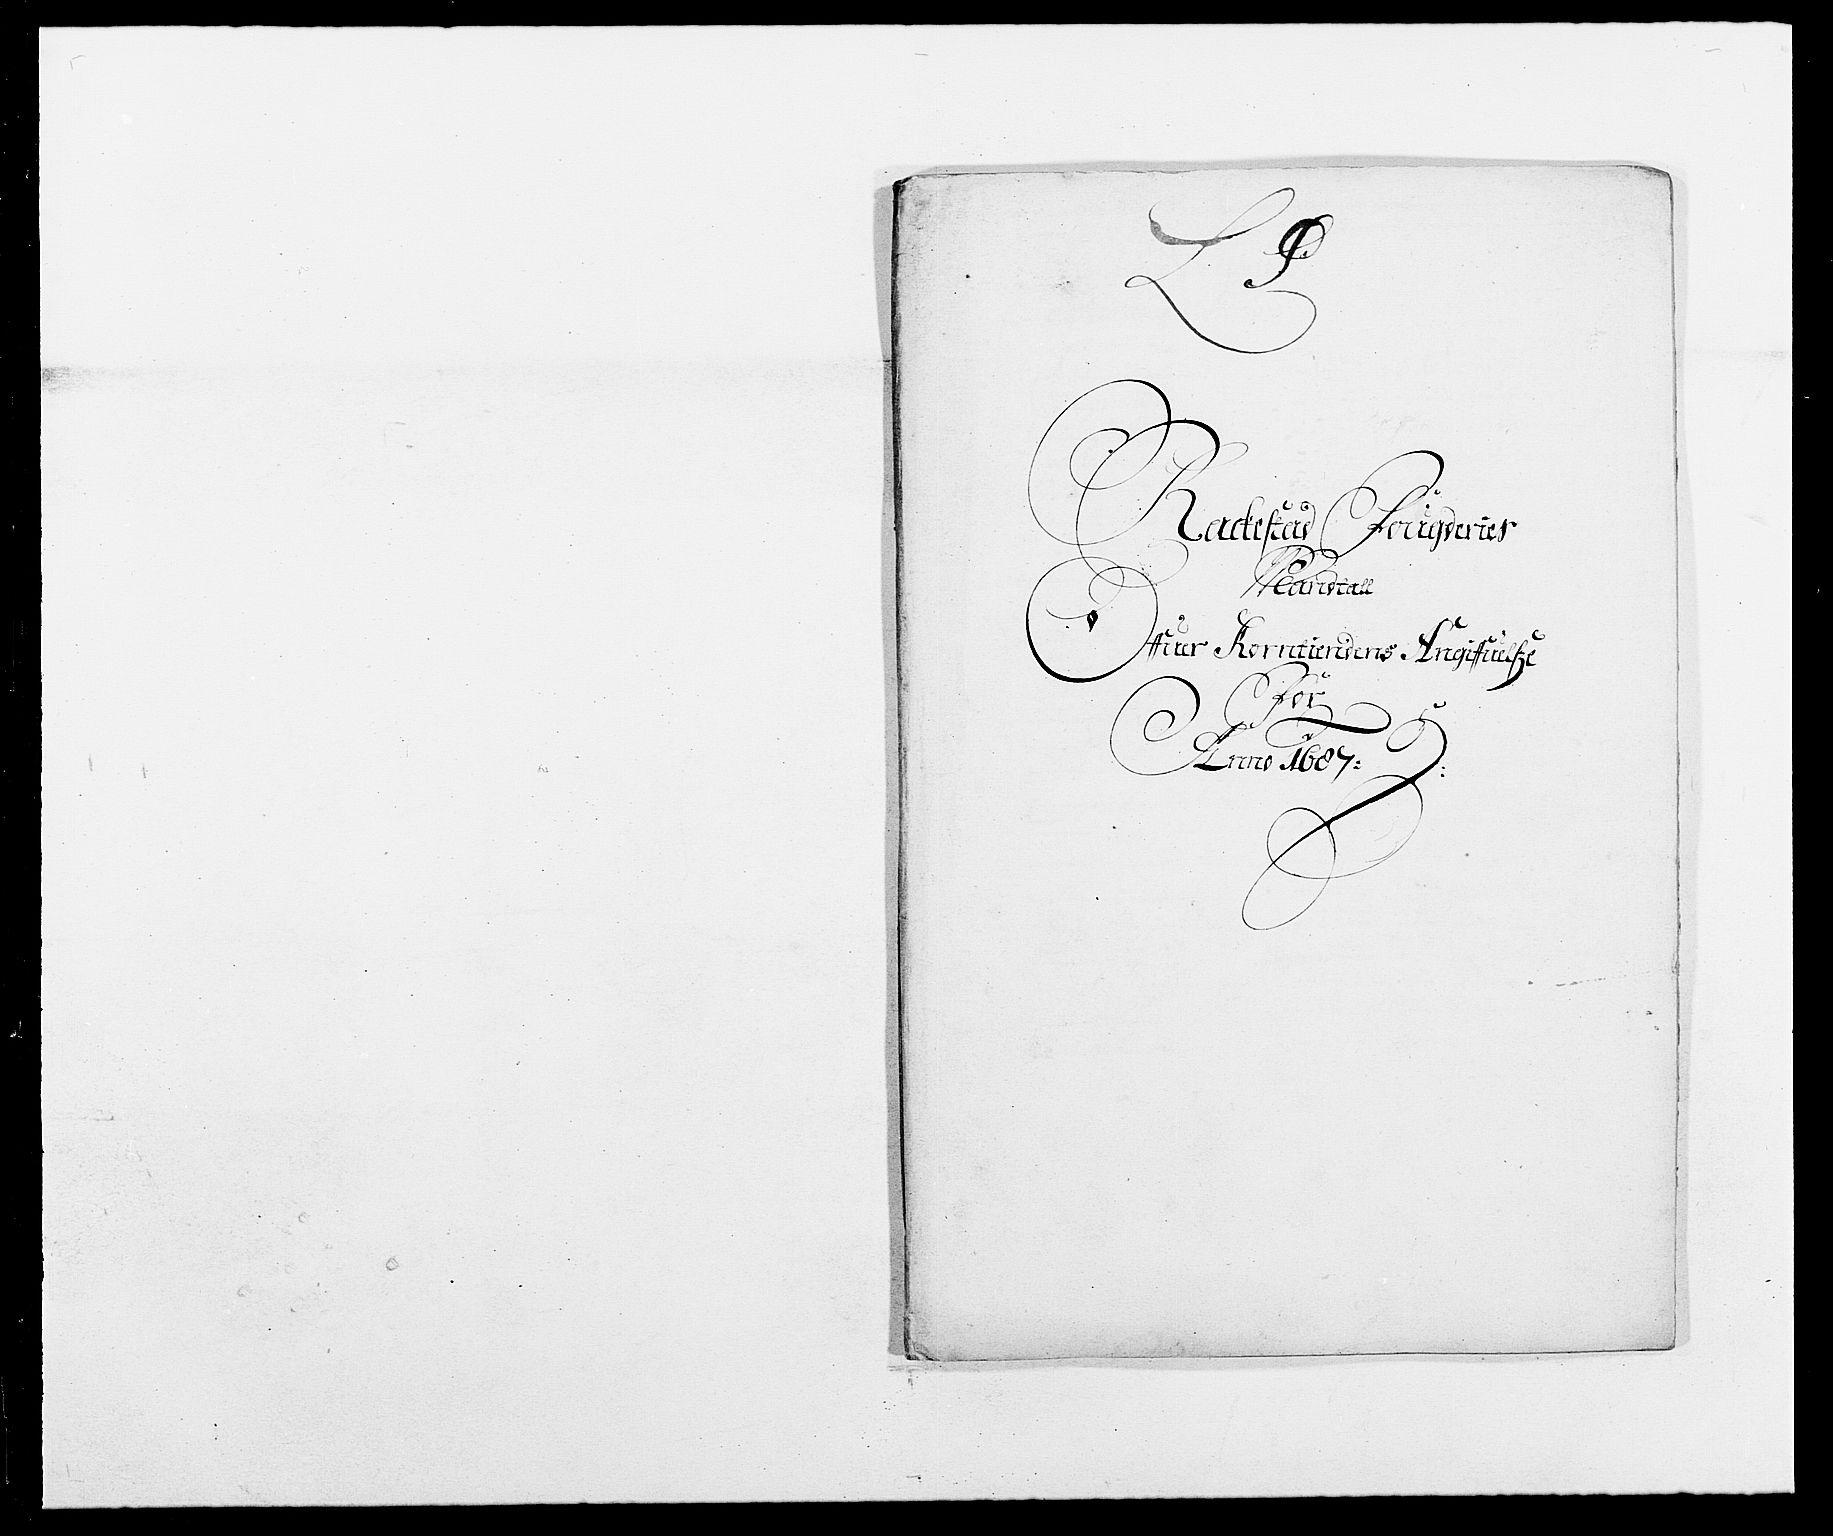 RA, Rentekammeret inntil 1814, Reviderte regnskaper, Fogderegnskap, R05/L0275: Fogderegnskap Rakkestad, 1685-1686, s. 304